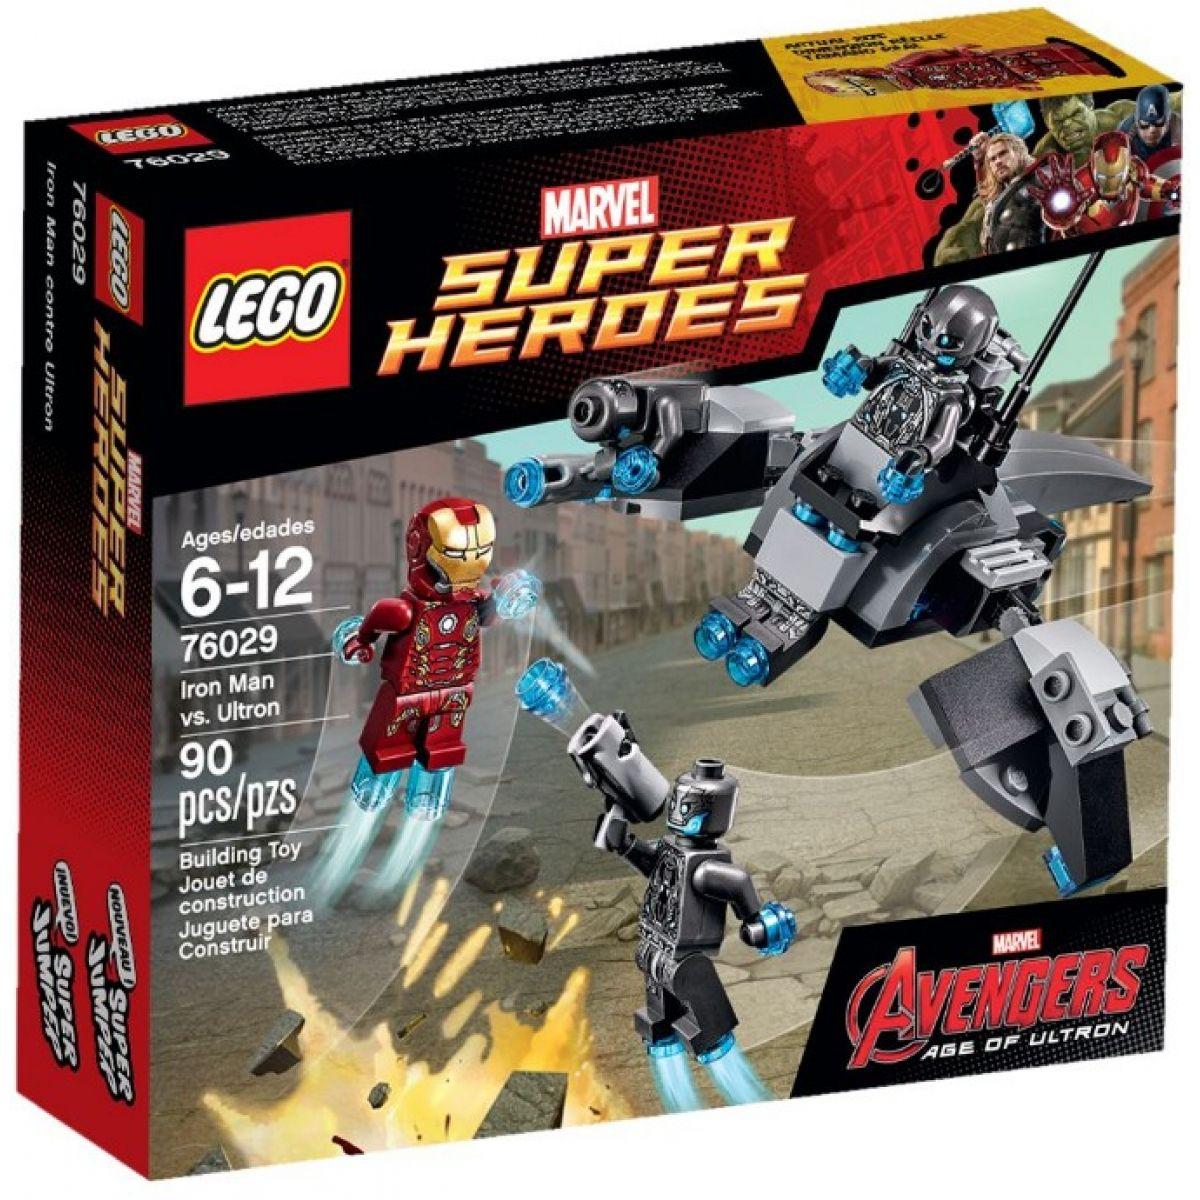 LEGO Super Heroes 76029 - Avengers #1